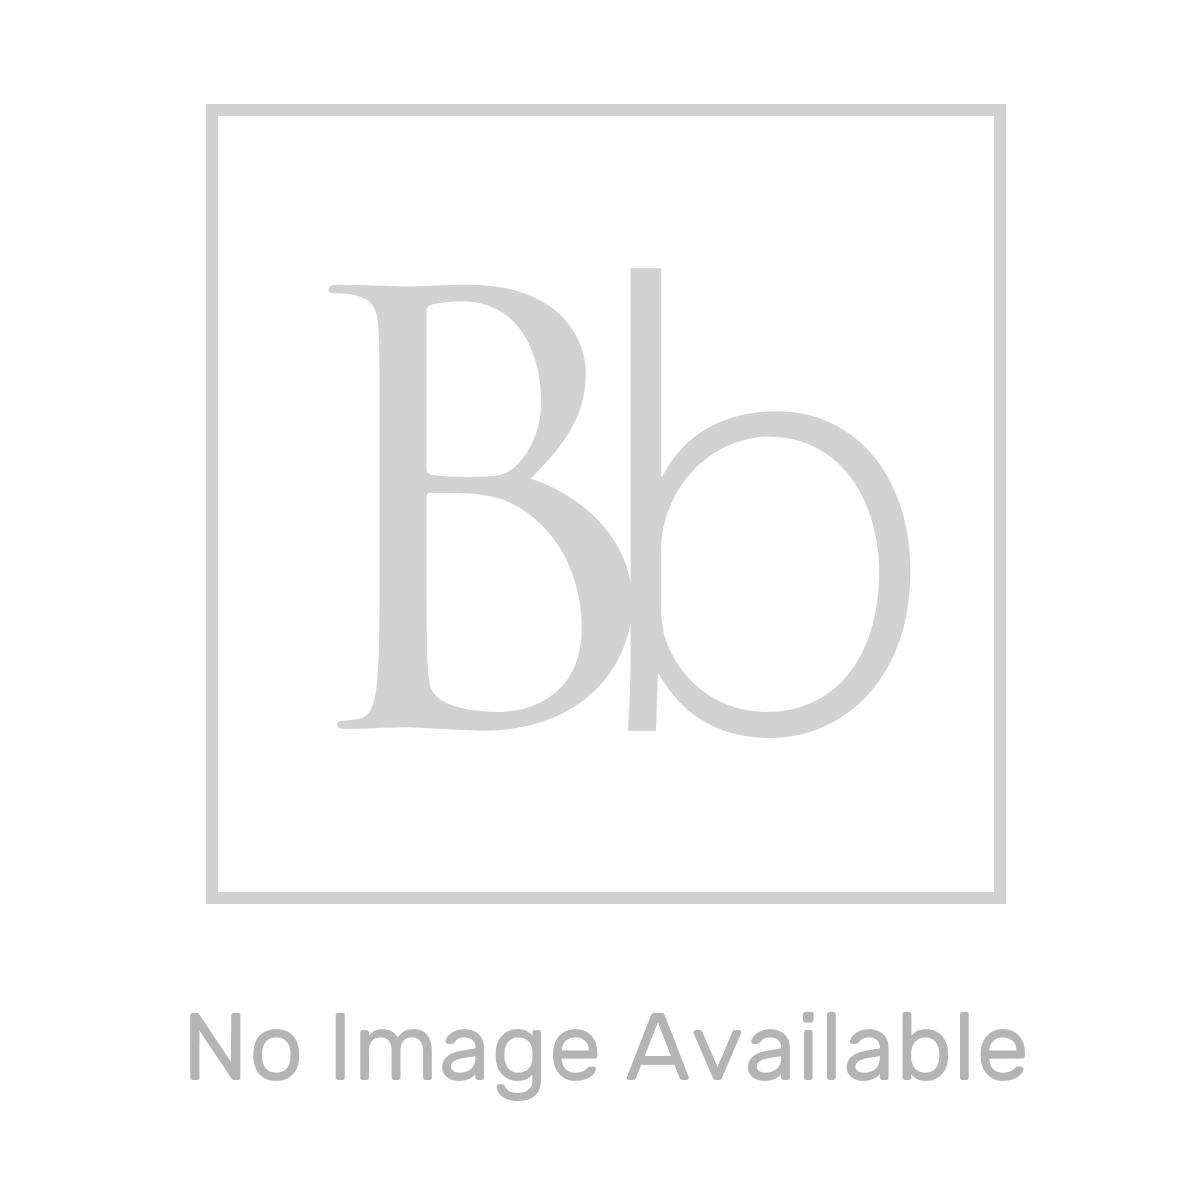 RAK Maremma Sand Matt Tile 750 x 750mm